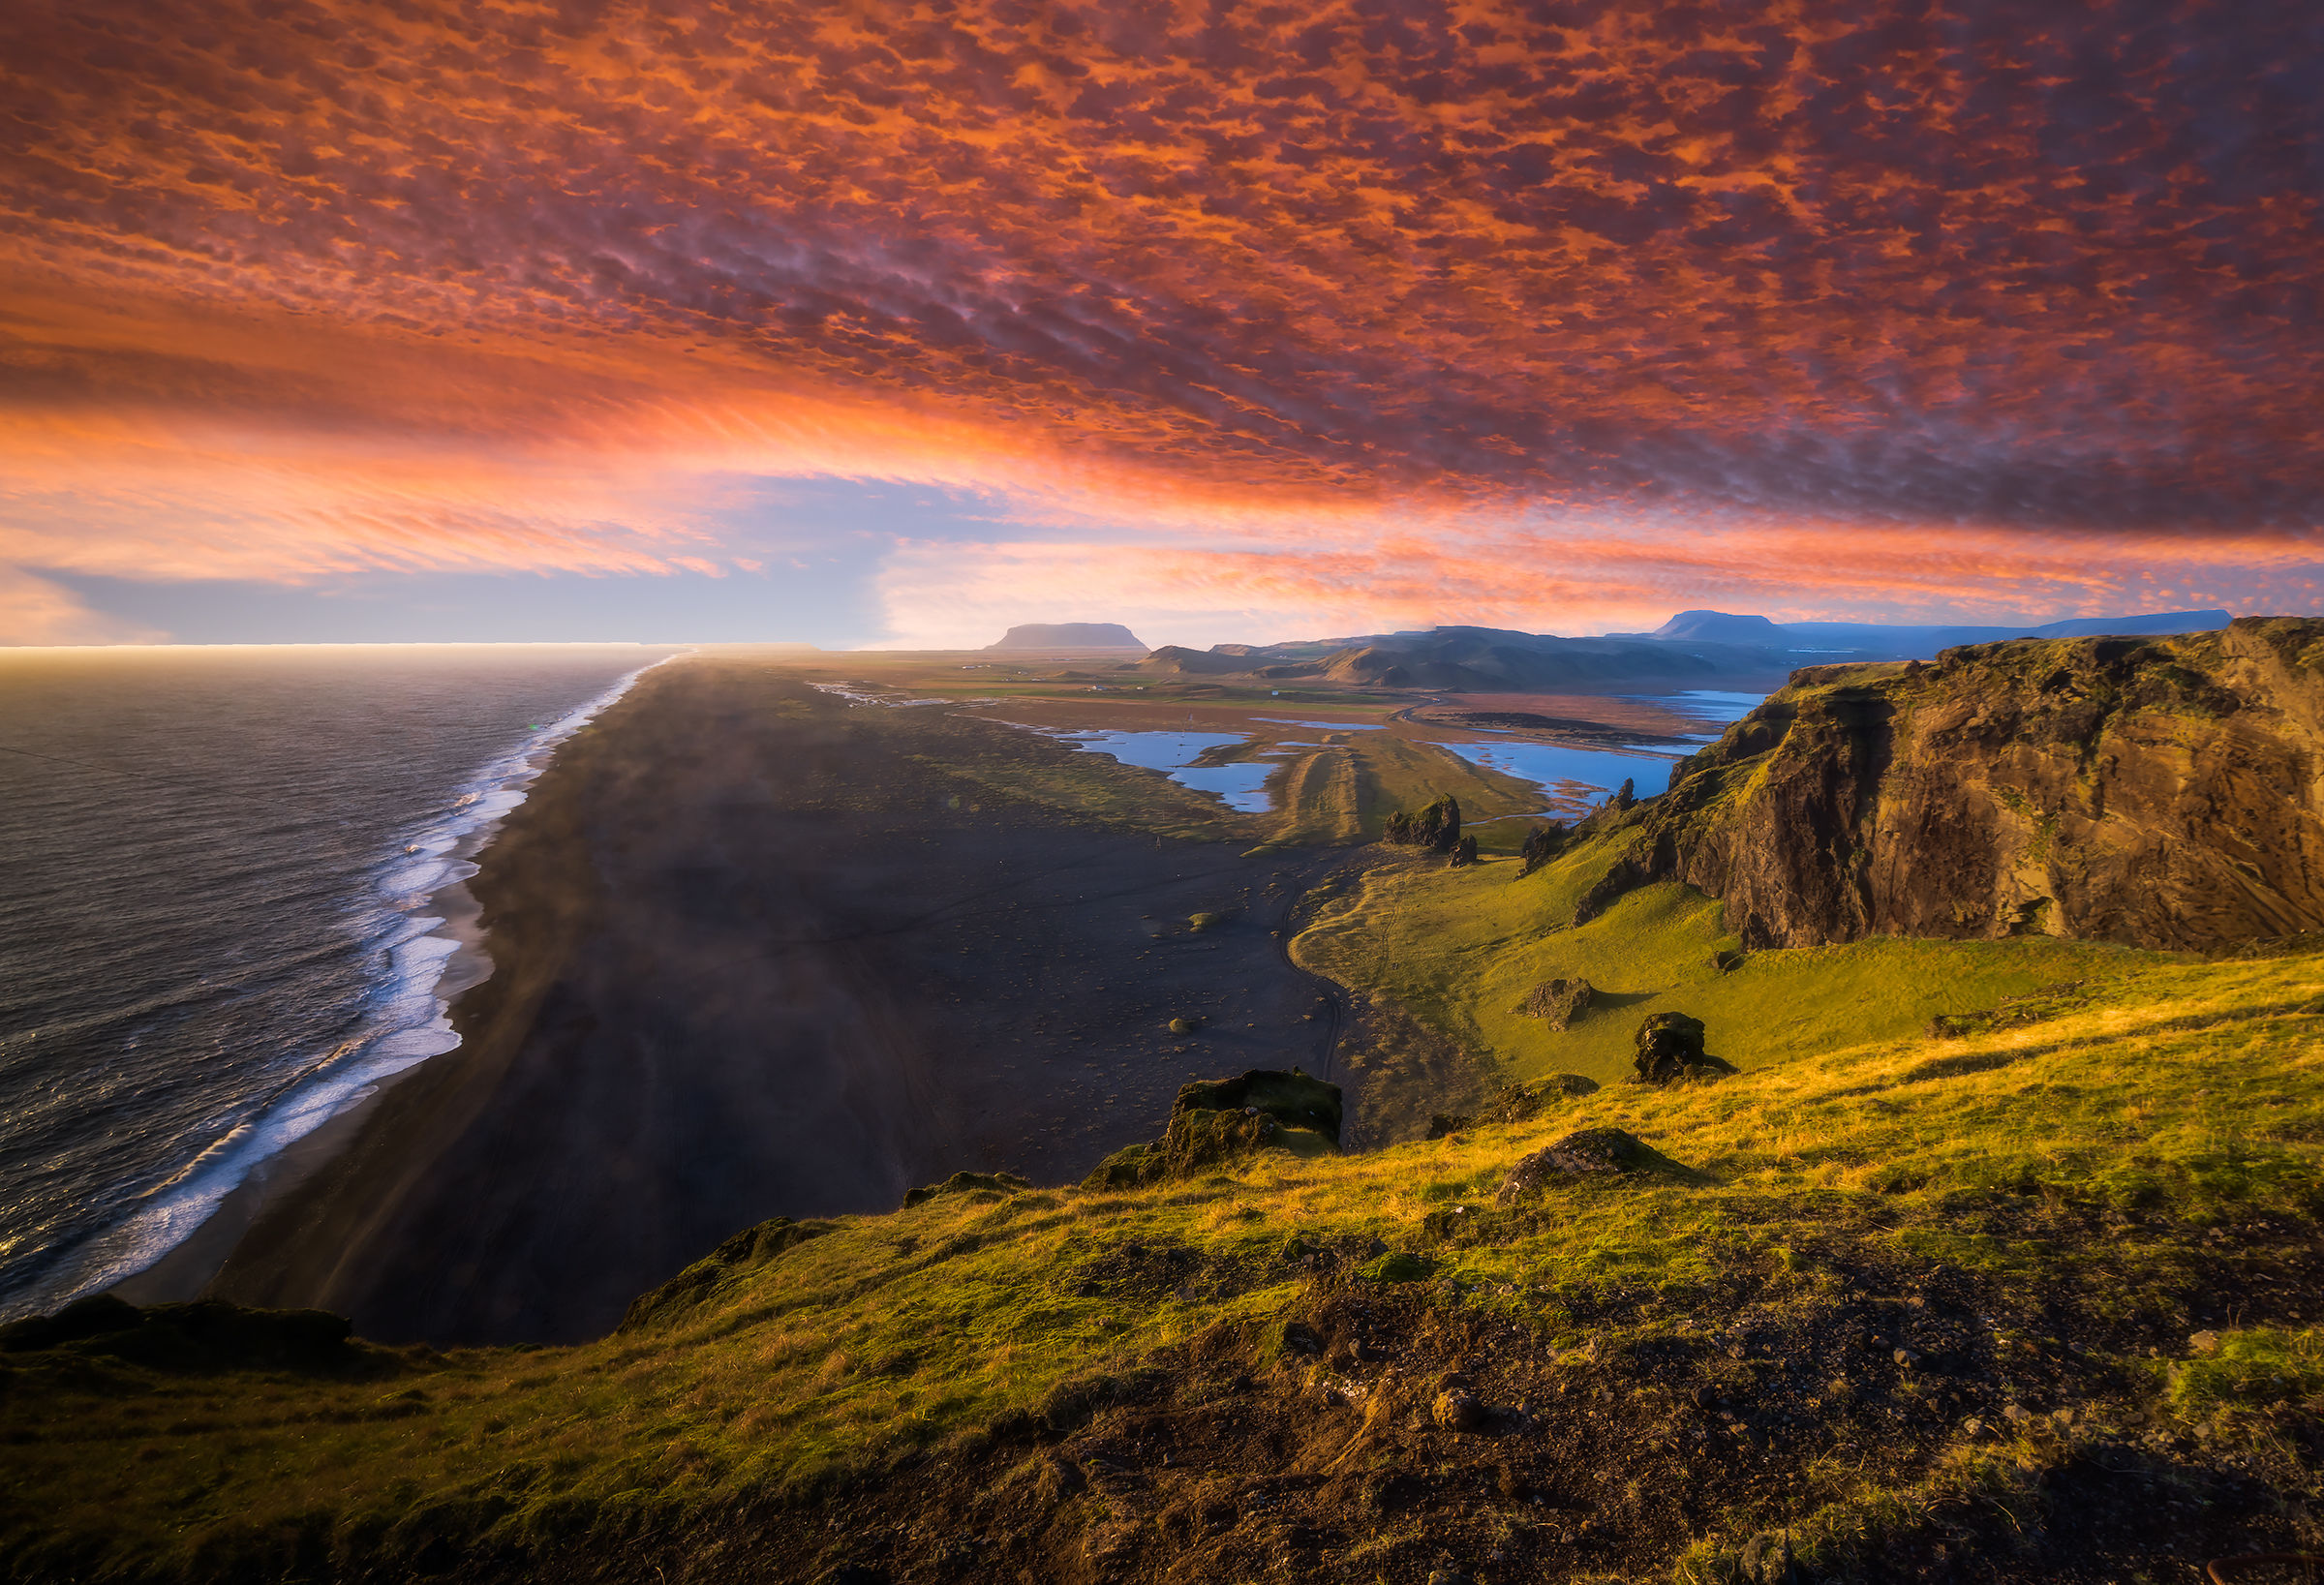 Arrivederci, Islanda, terra delle meraviglie...